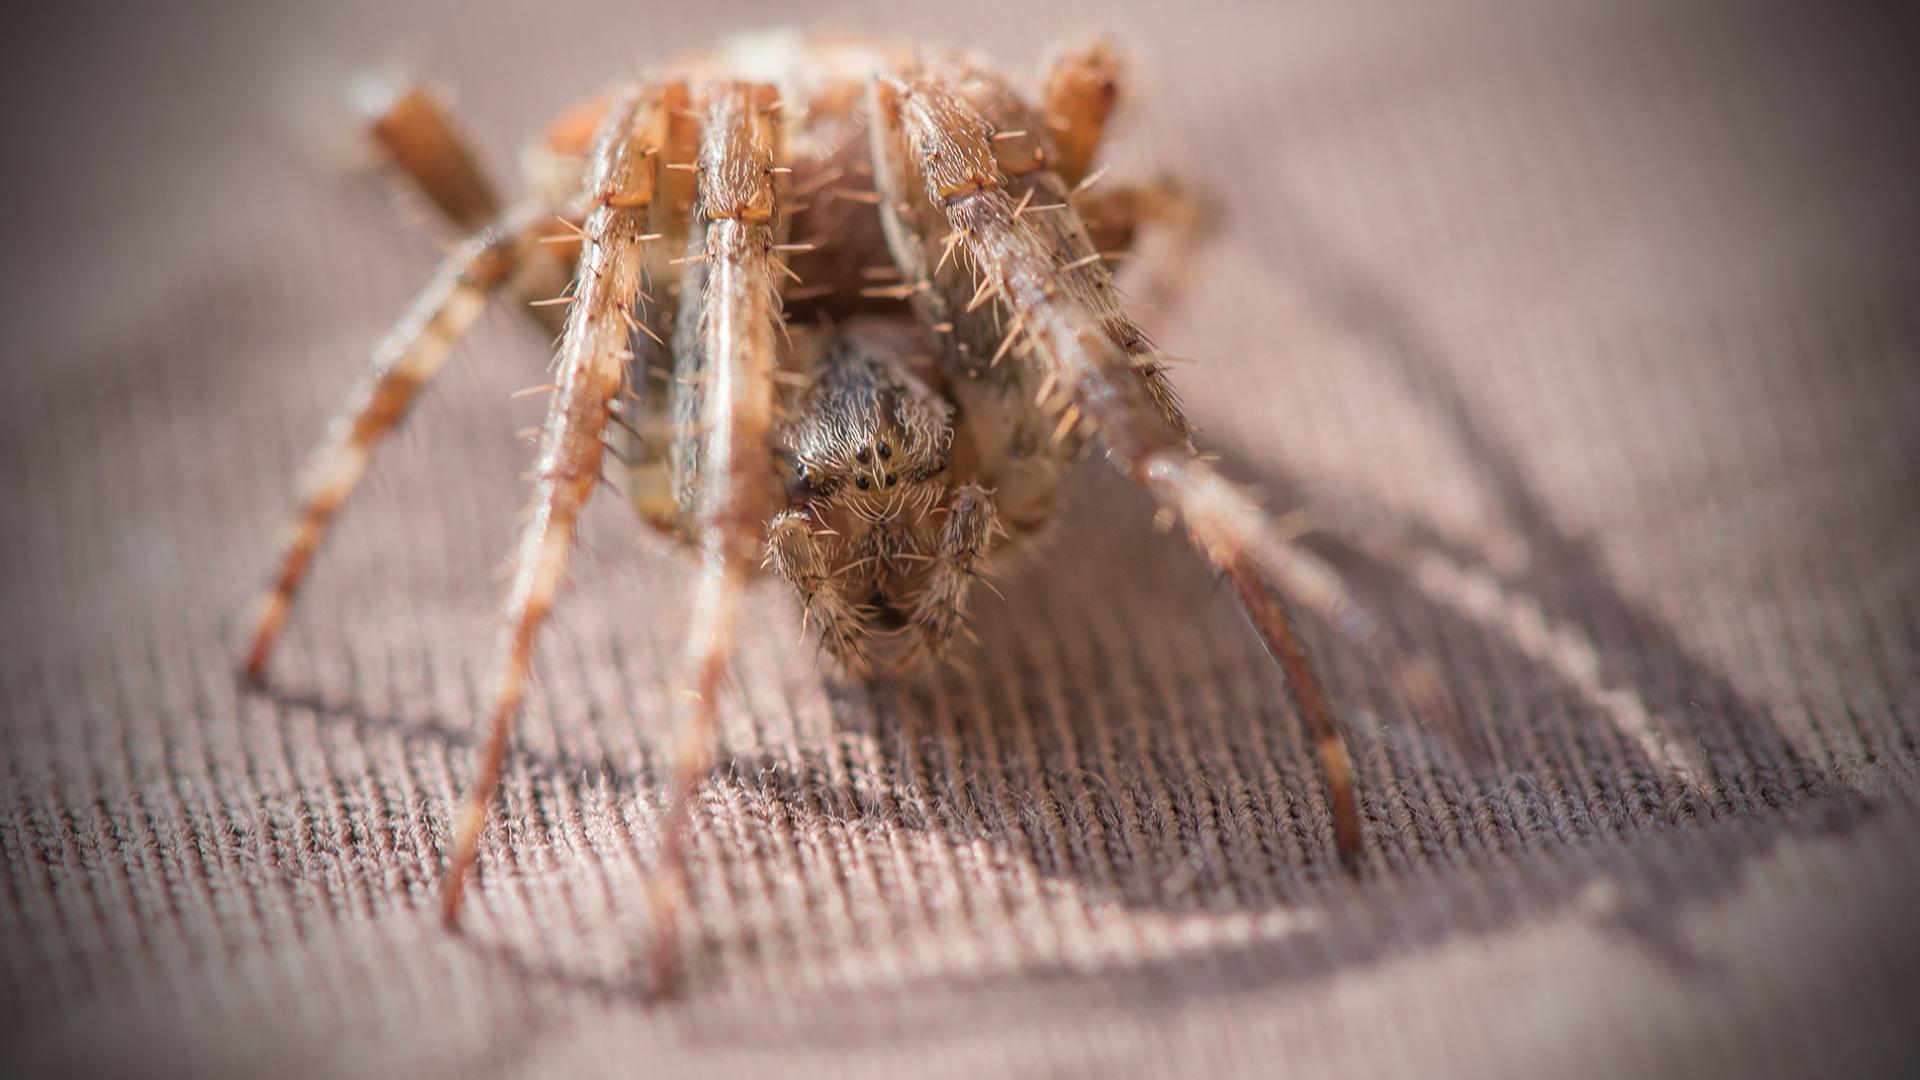 Spider by Per Martens